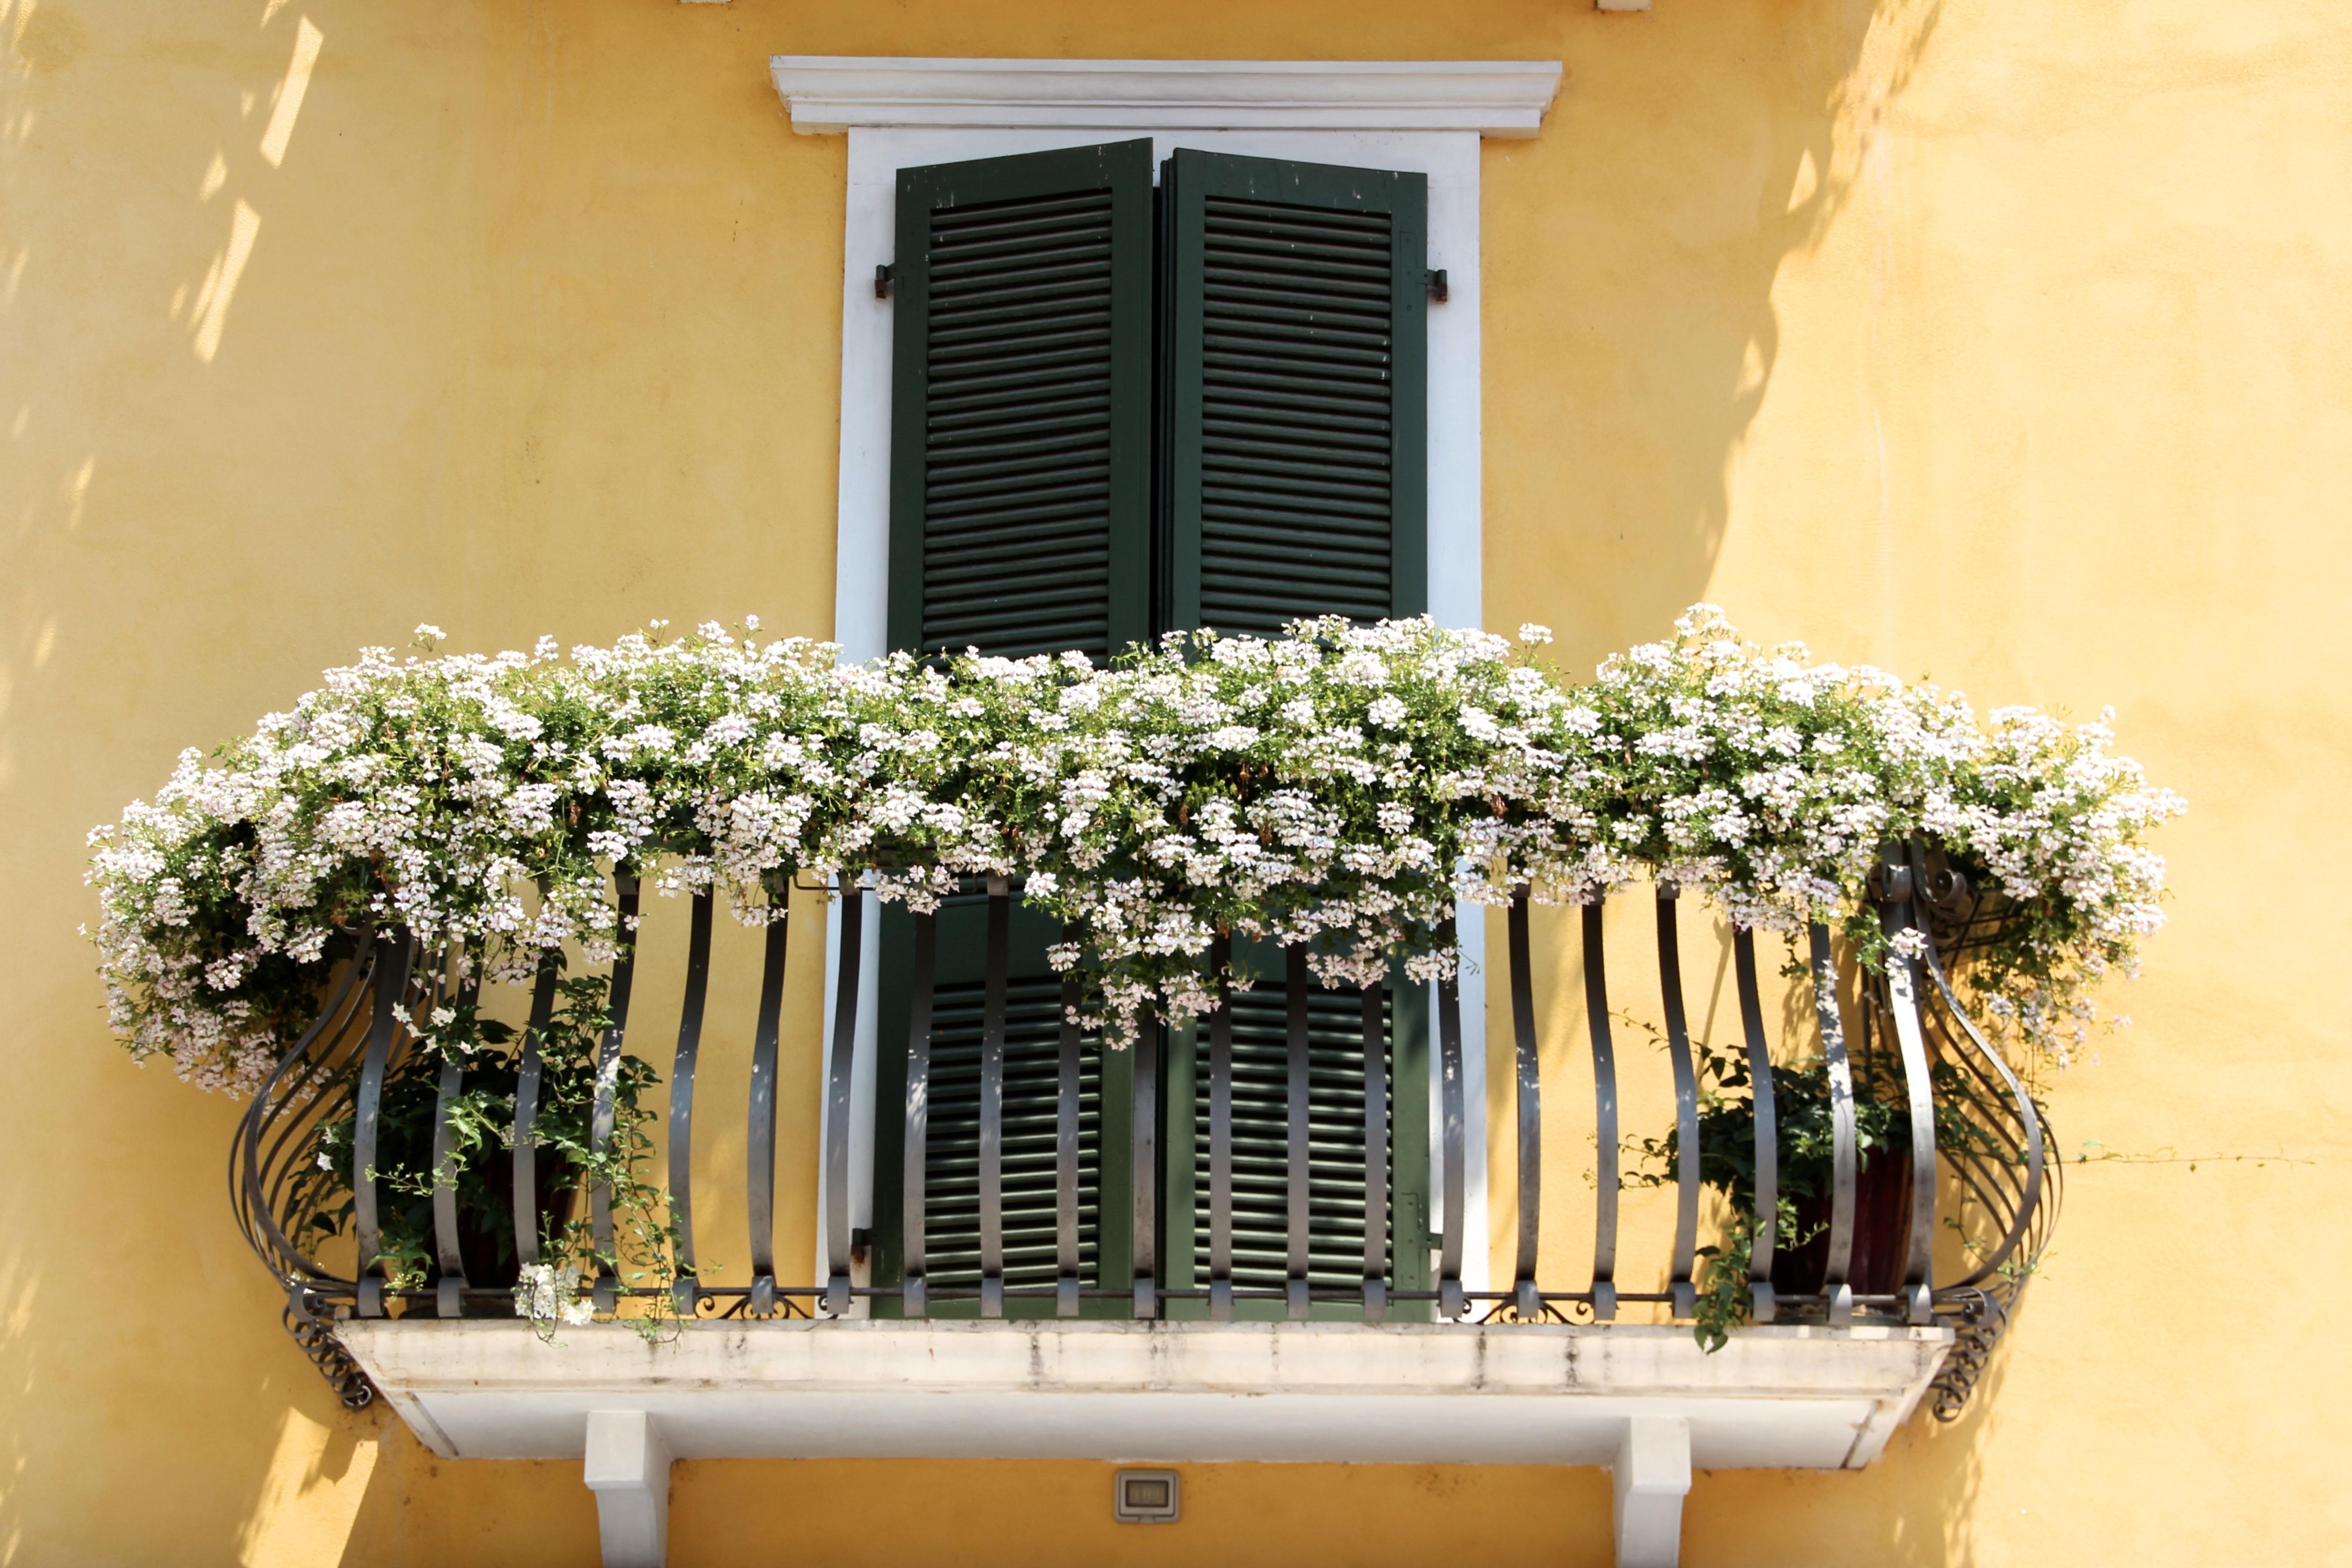 Картинки : растение, цветок, окно, главная, балкон, италия, .